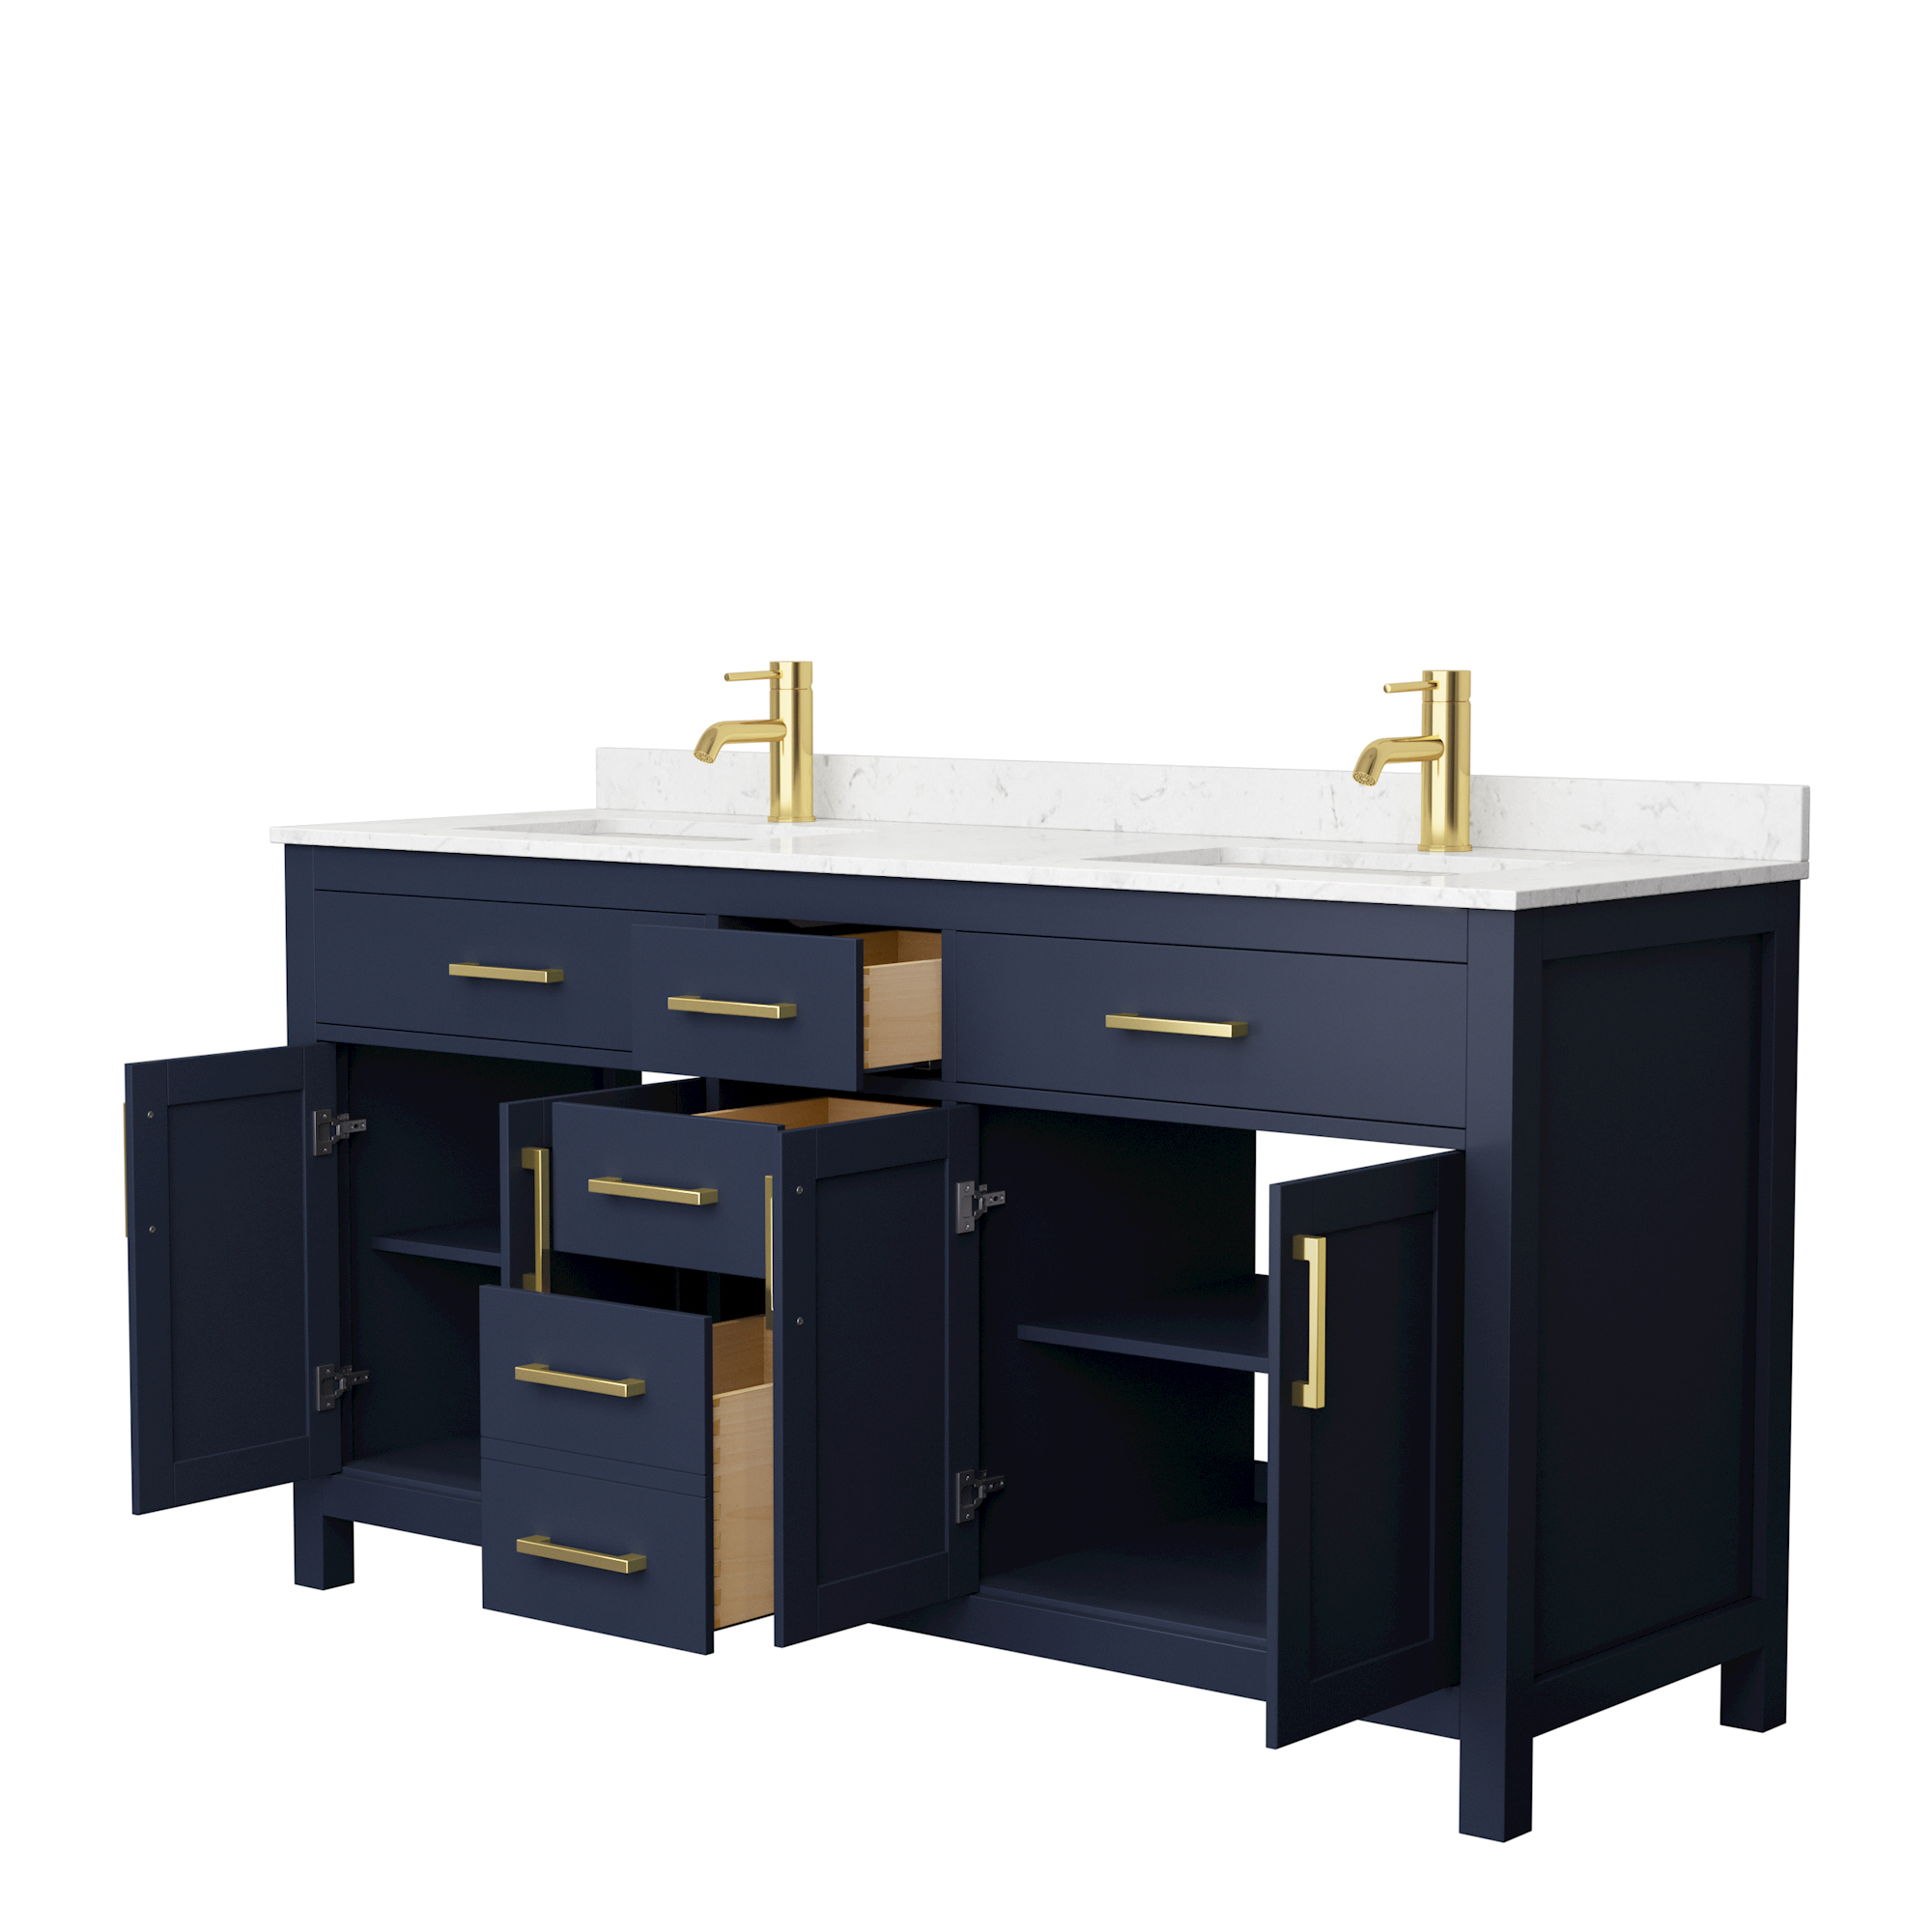 Beckett 66 Double Bathroom Vanity Dark Blue Beautiful Bathroom Furniture For Every Home Wyndham Collection